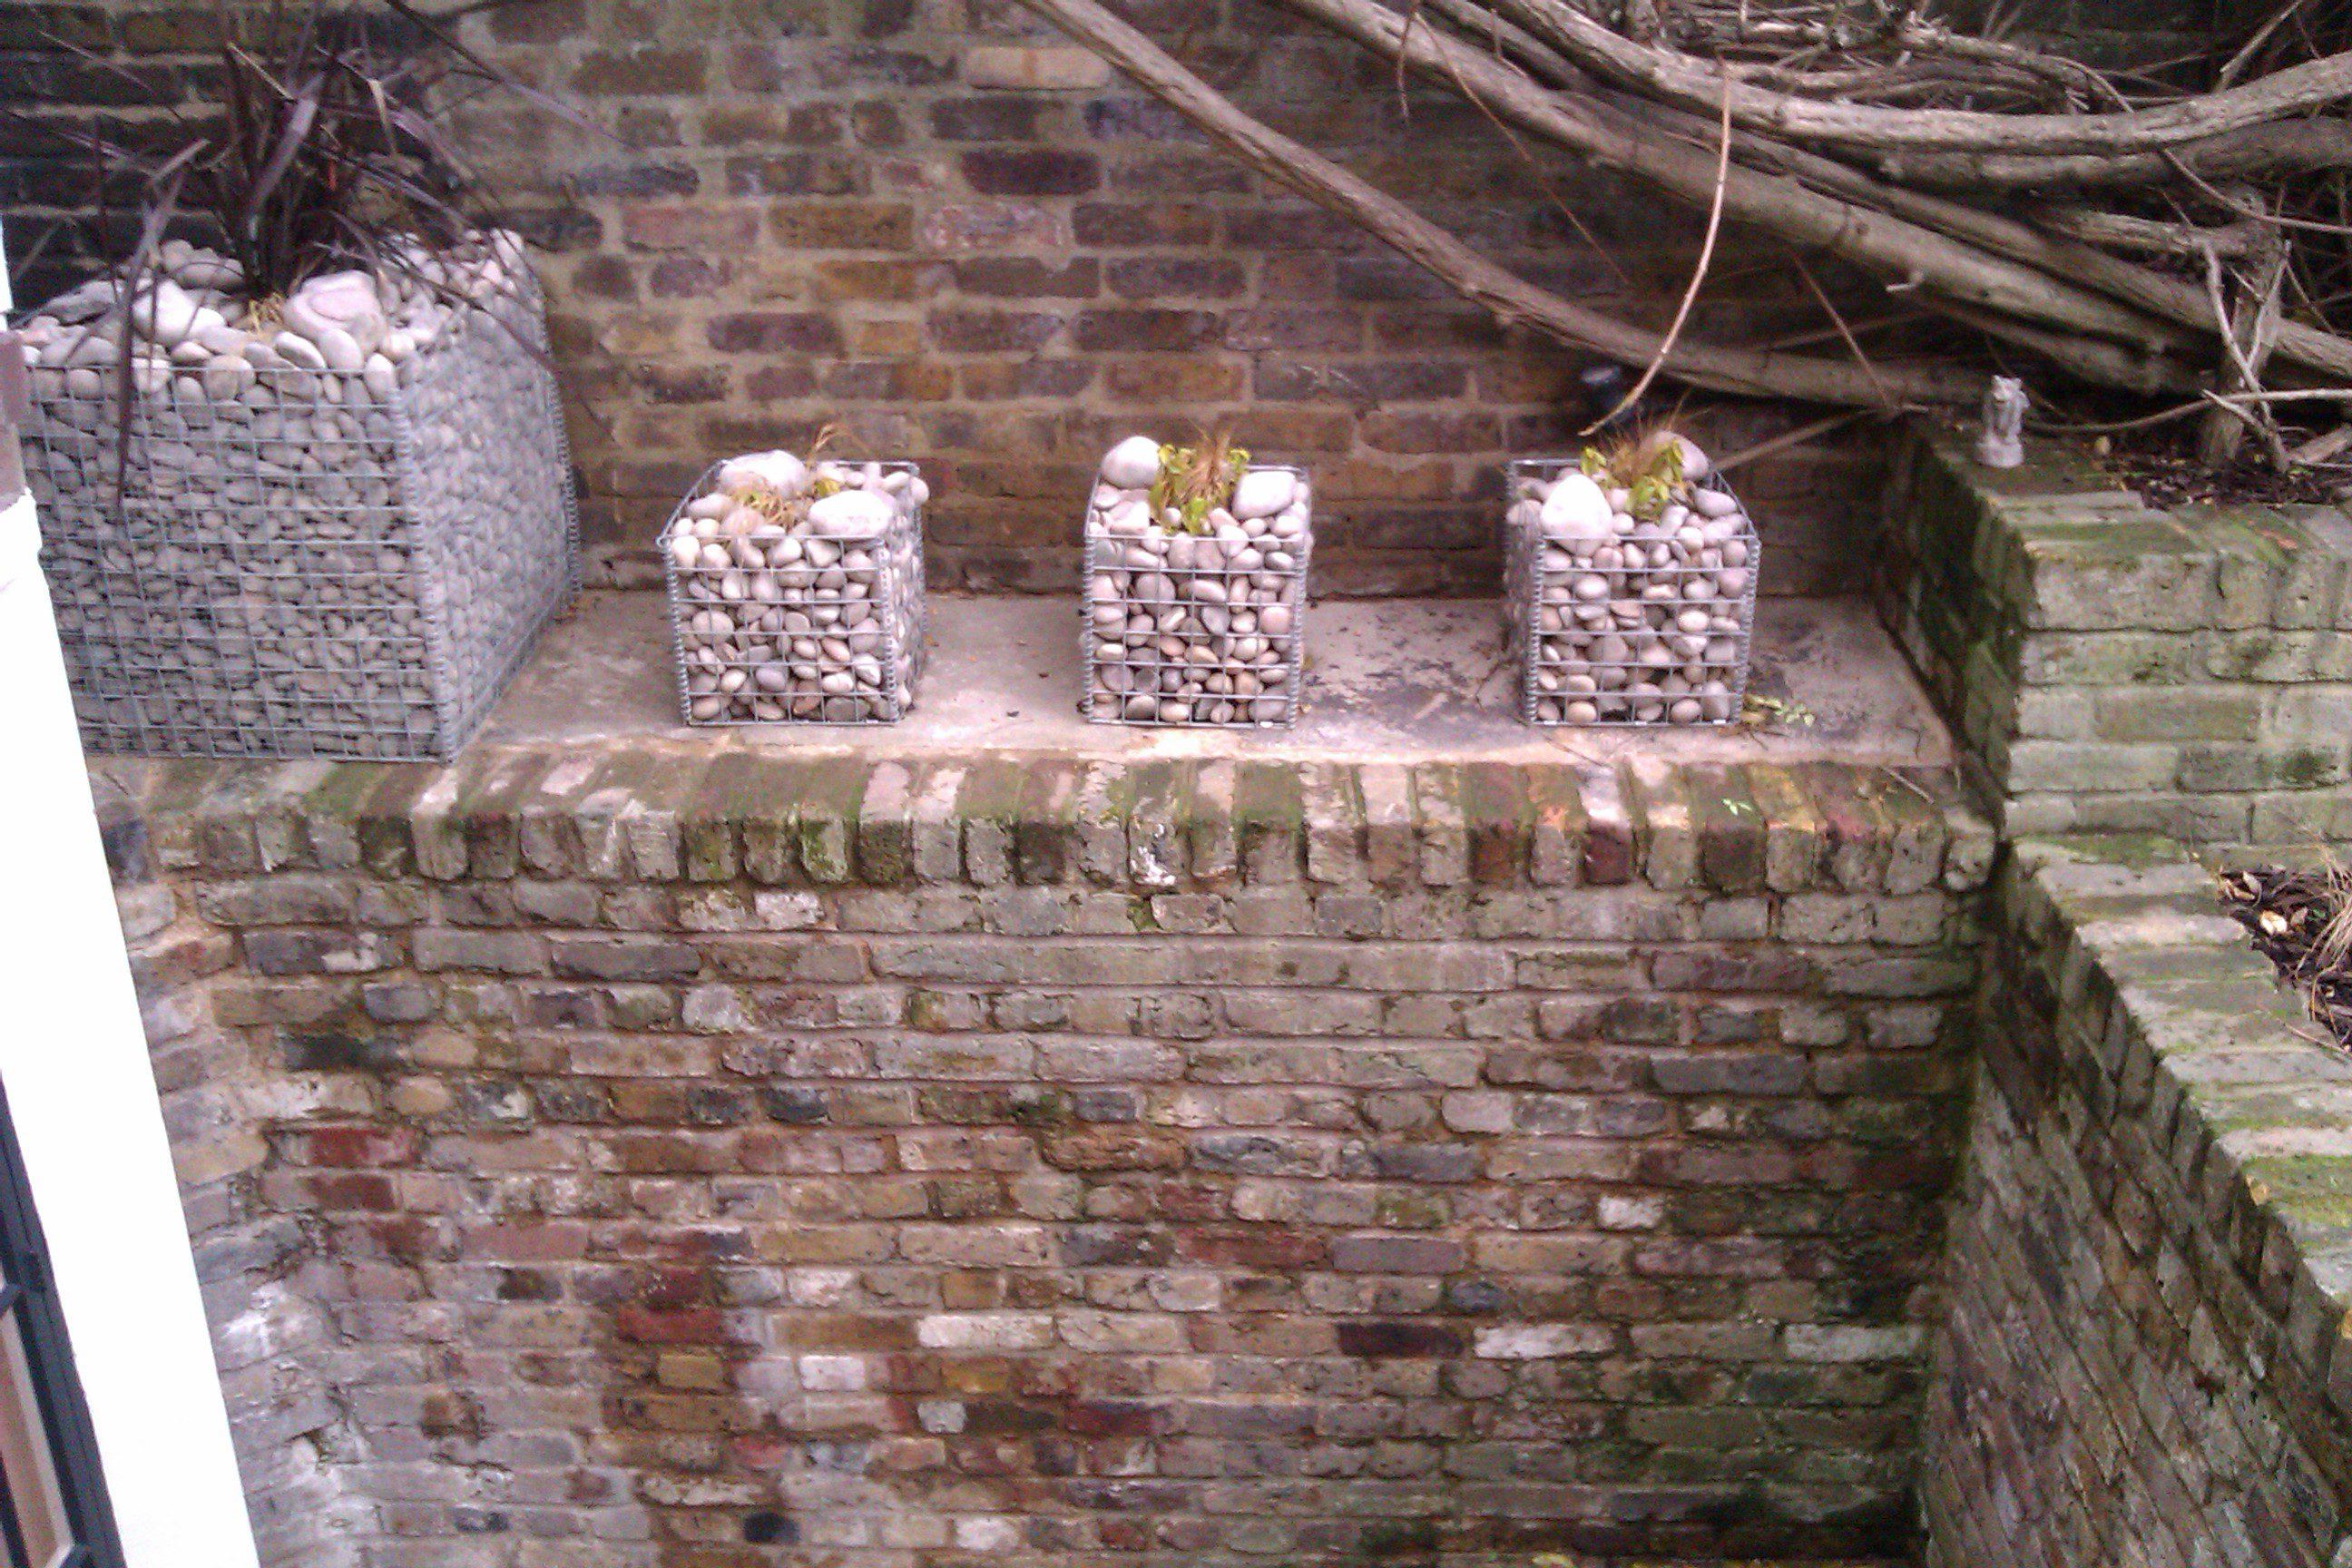 Garden Design With Stones